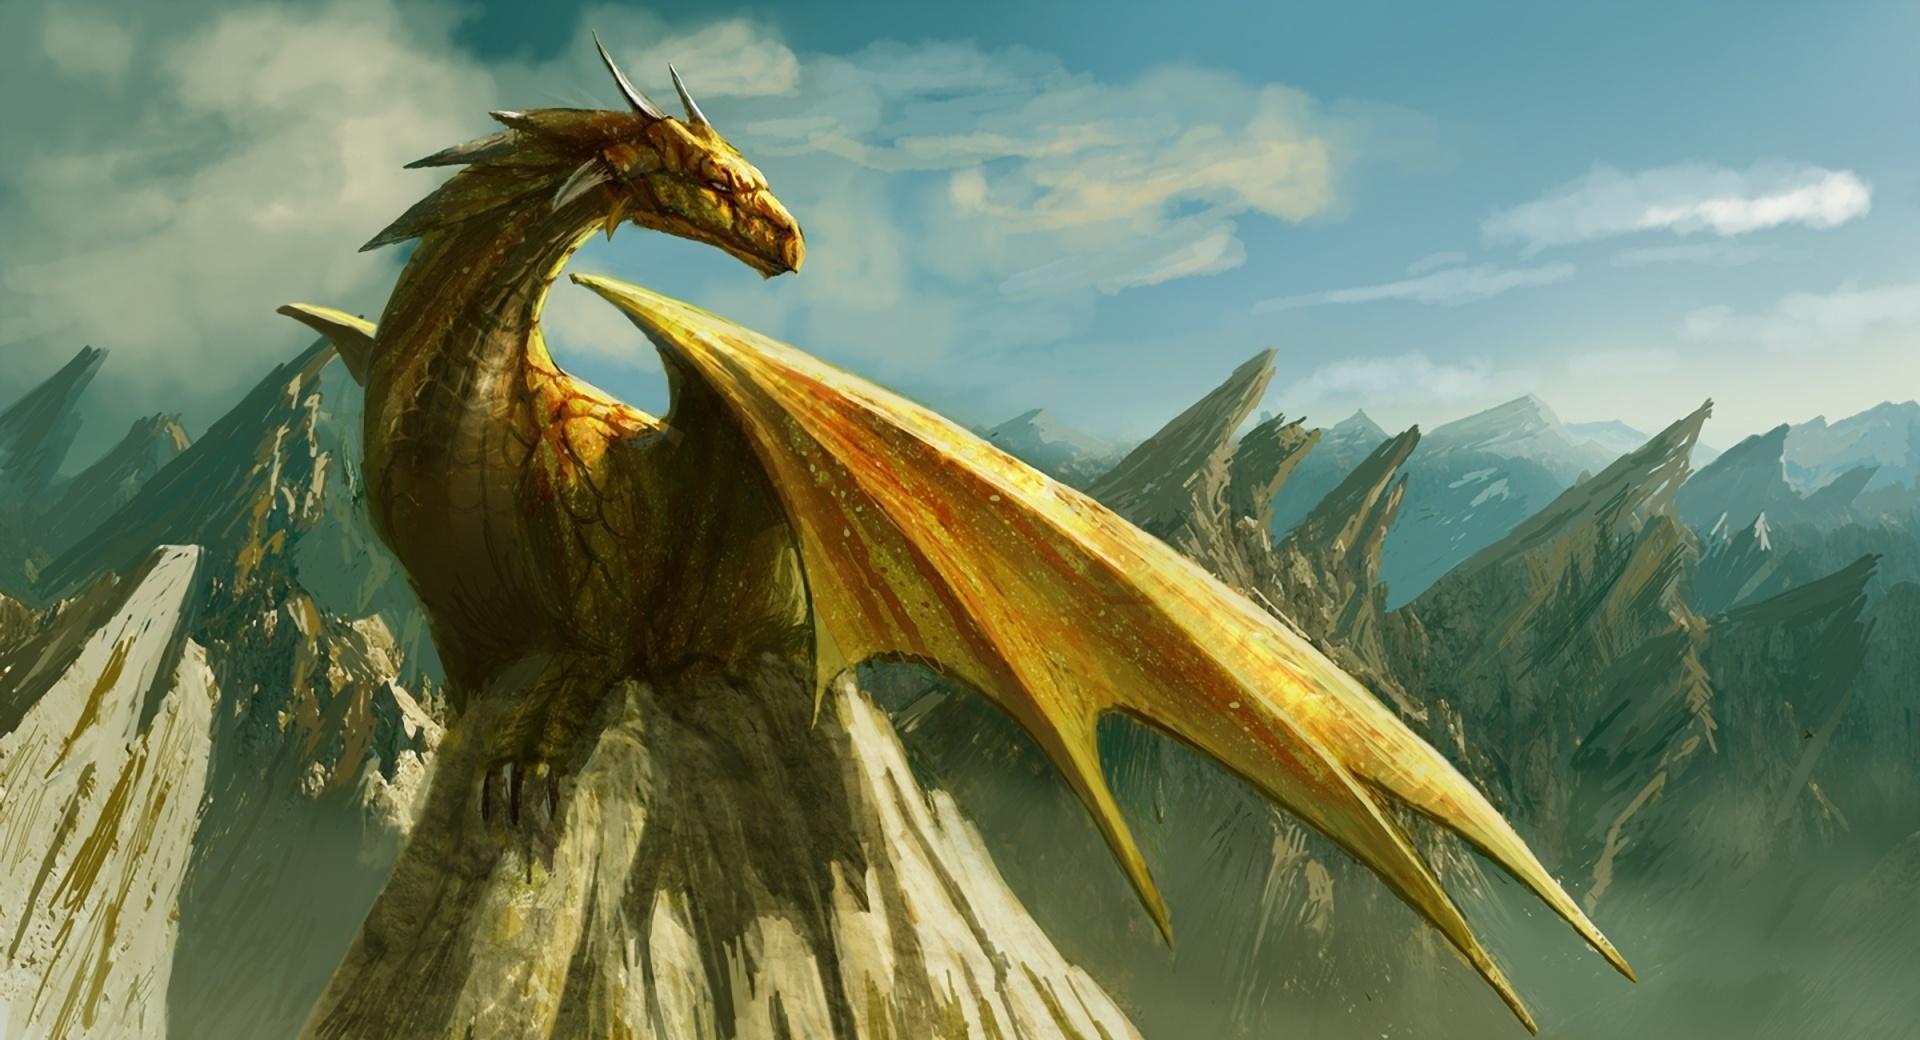 Dragon Paining Art wallpapers HD quality